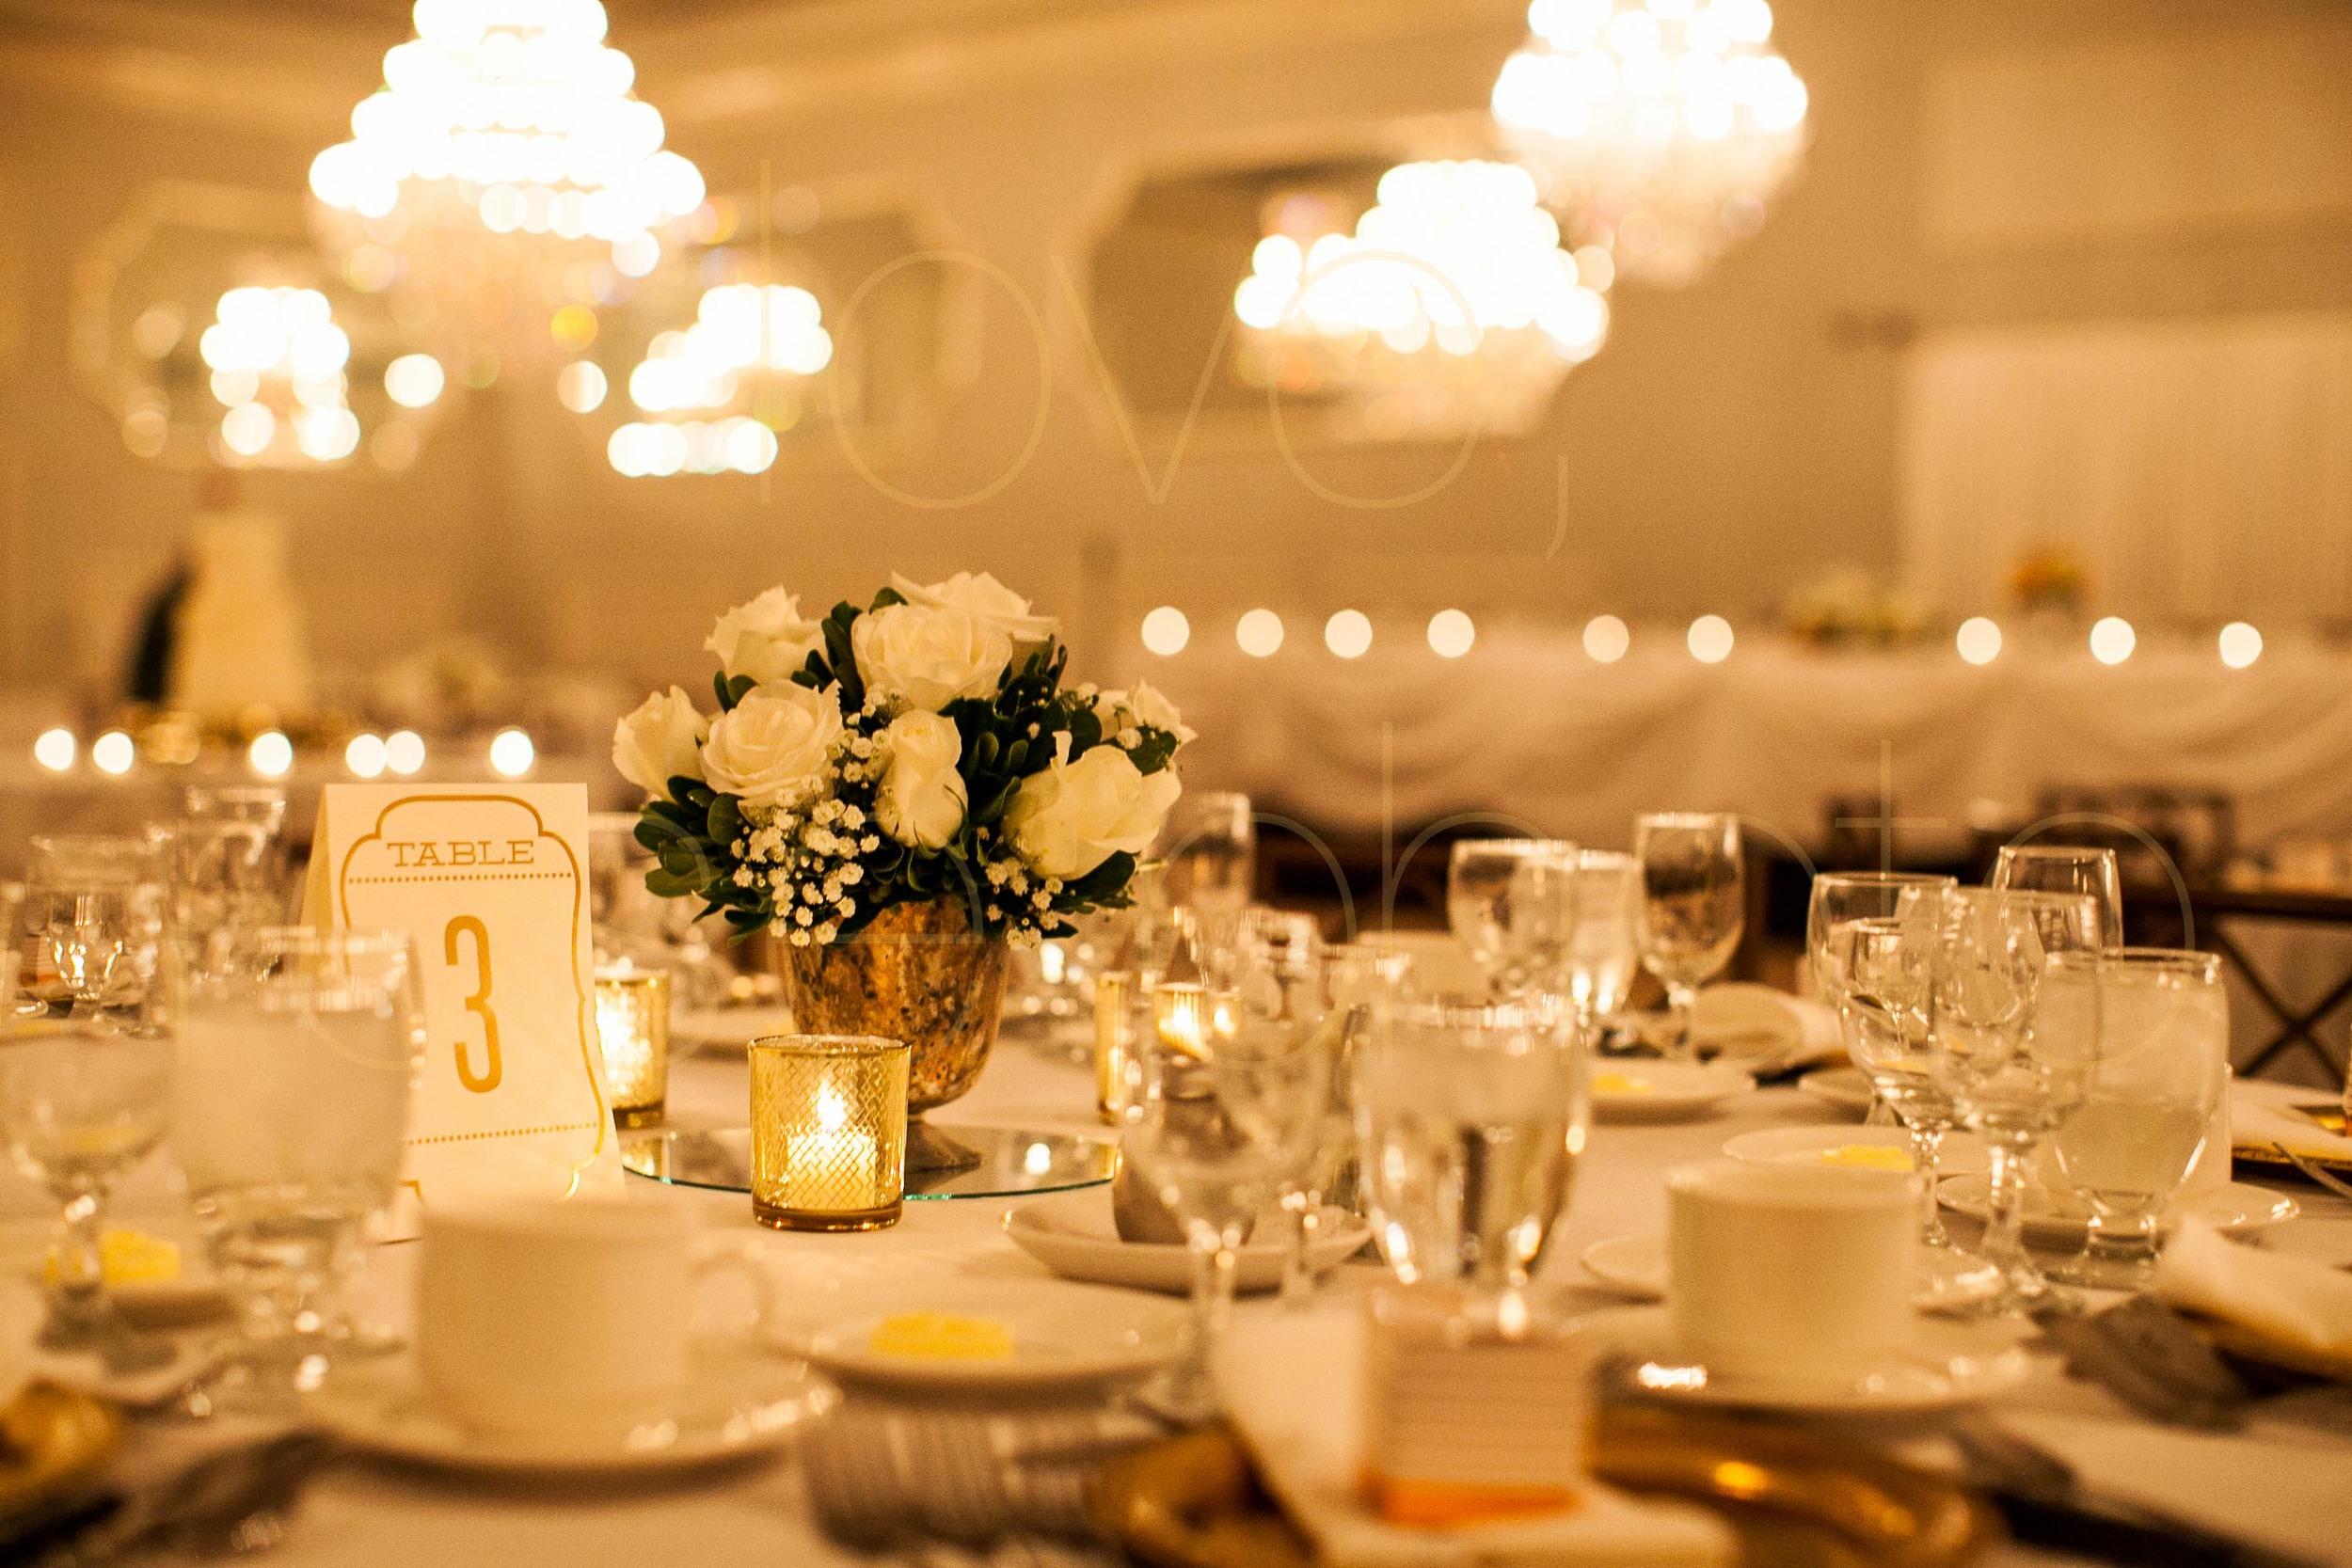 K Bianci maple chaple summer wedding chicago photographer -0342.jpg